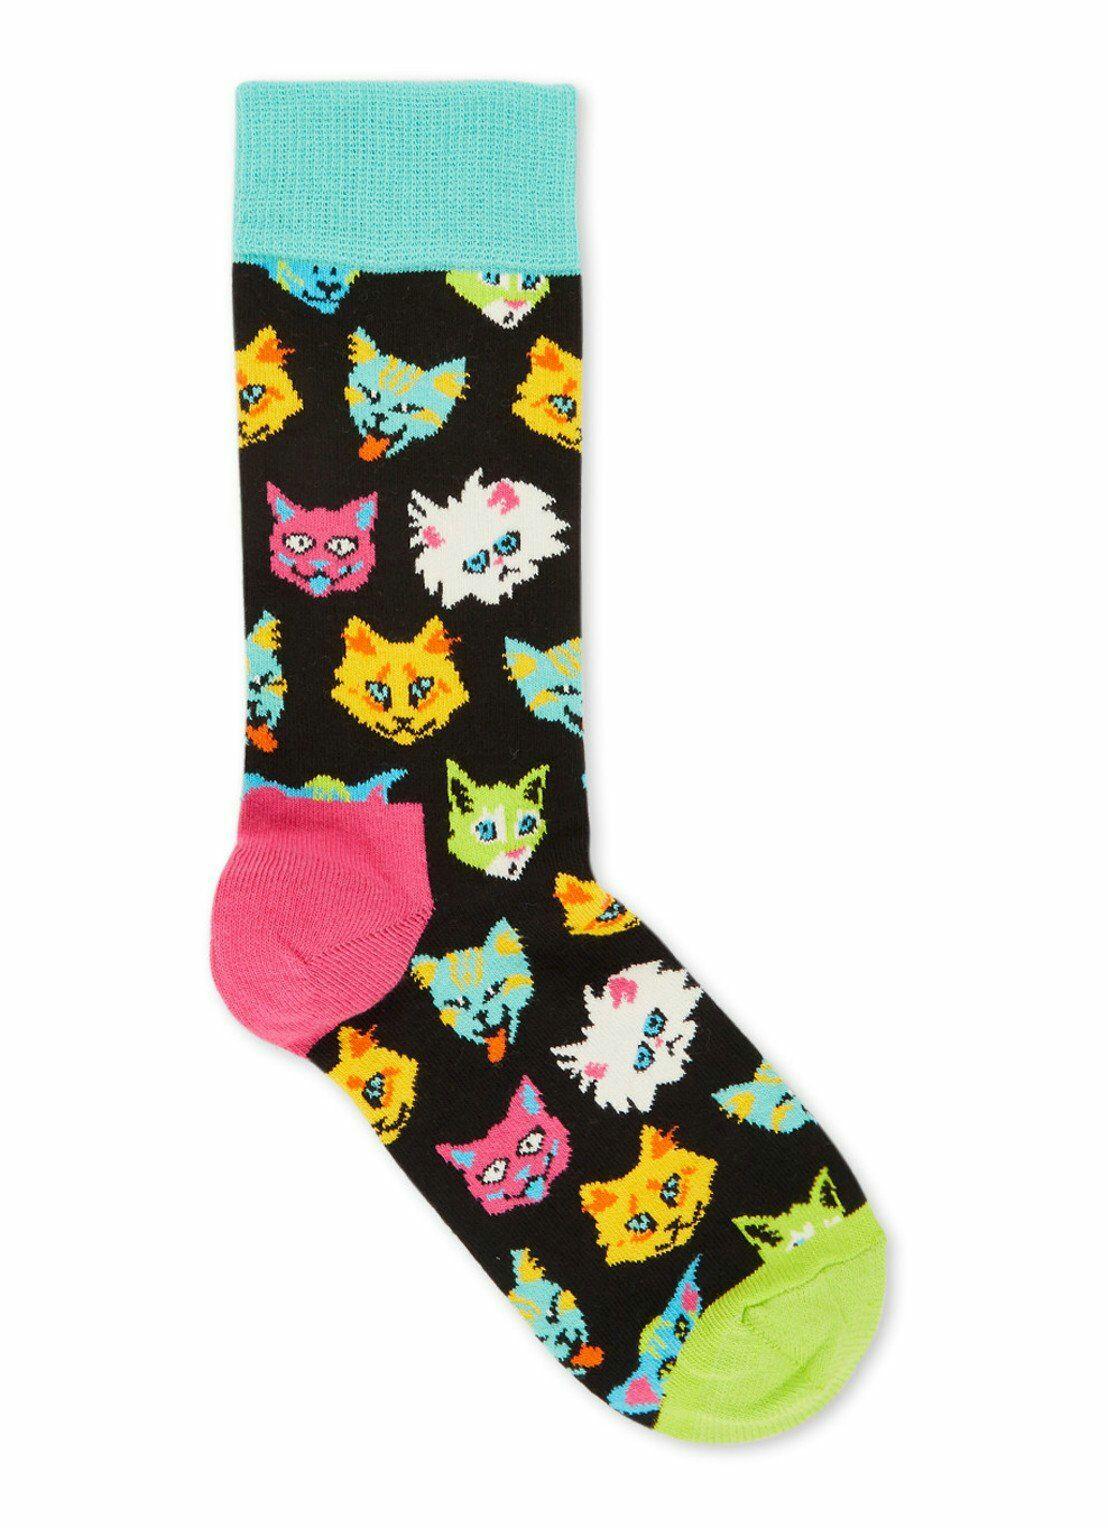 Happy Socks Funny Cat sokken of Happy Socks Pizza sokken (maat 36-40) @Bijenkorf